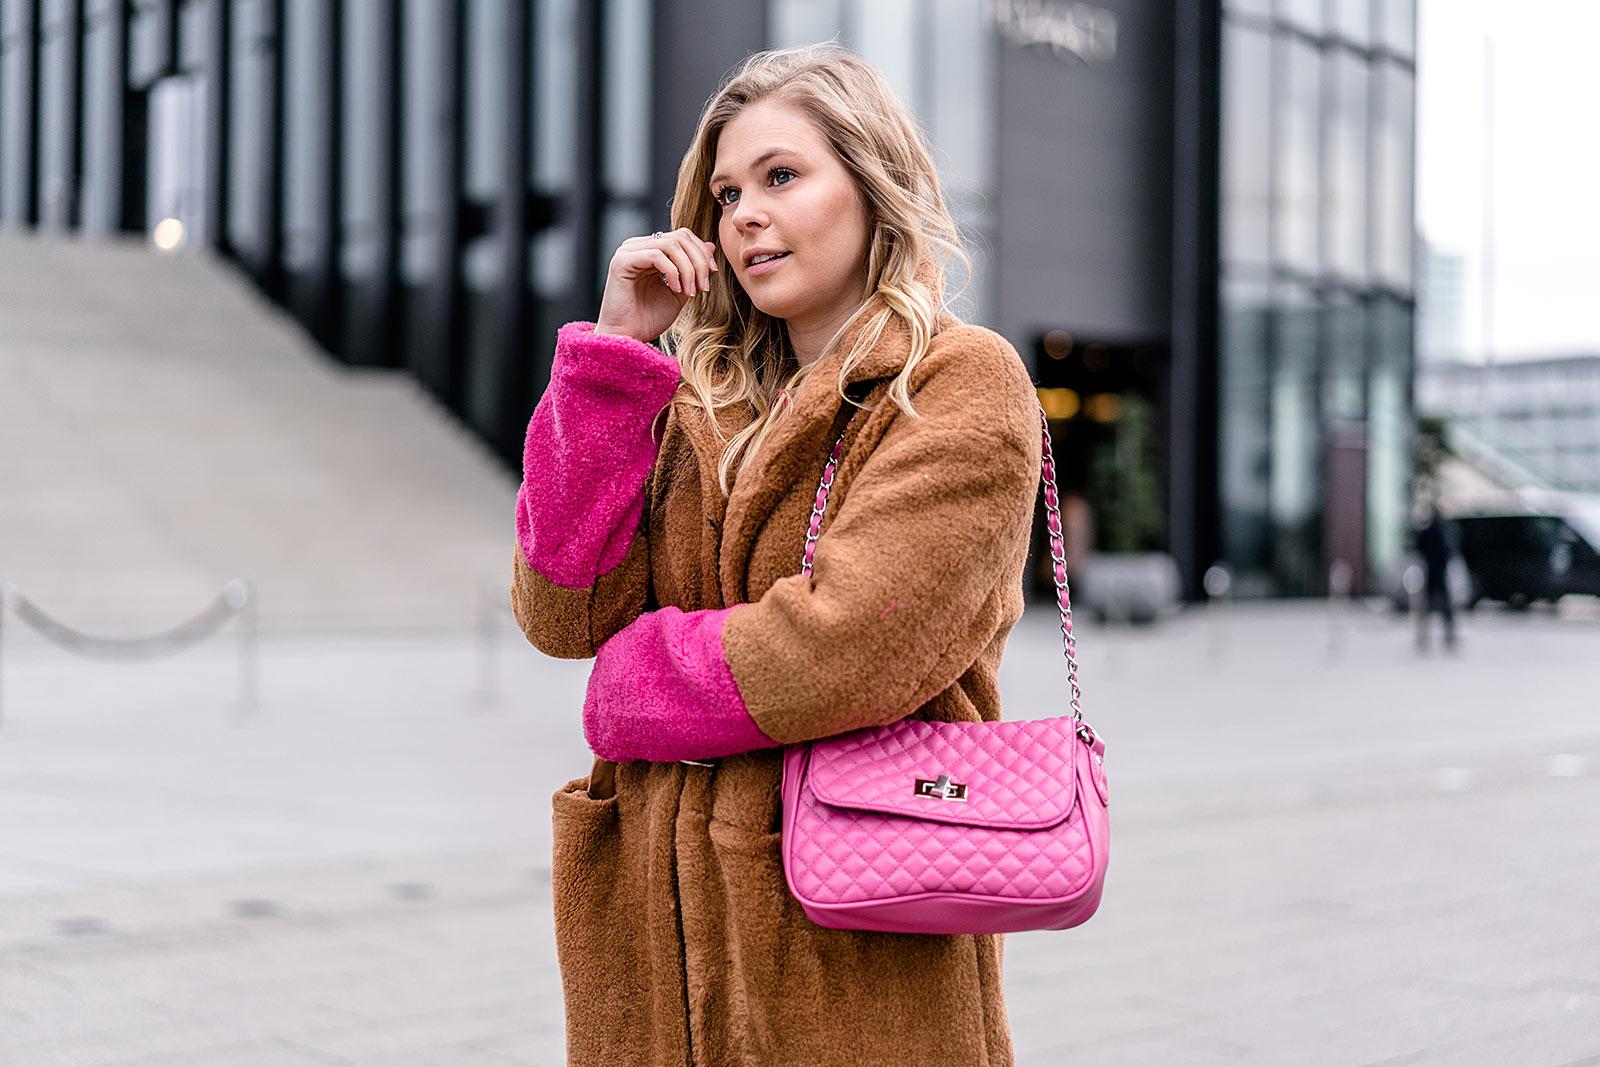 Tasche pink Outfit Sunnyinga Fashion Blog ootd Streetstyle Düsseldorf